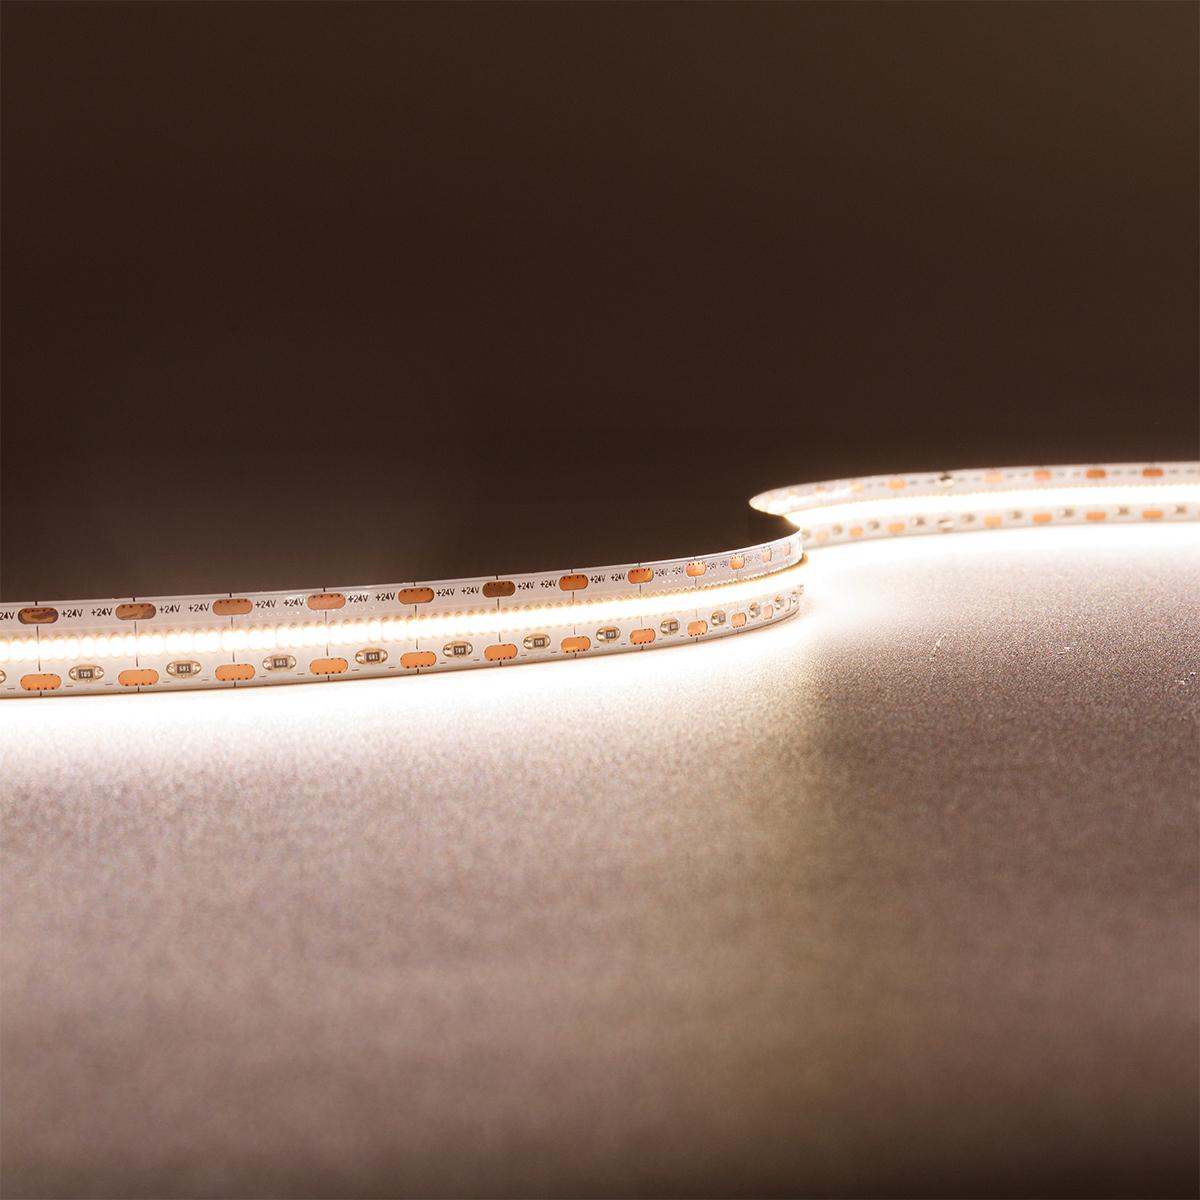 Strip Neutralweiß 24V CRI90 LED Streifen 5M 18W/m 700LED/m 10mm IP20 4000K